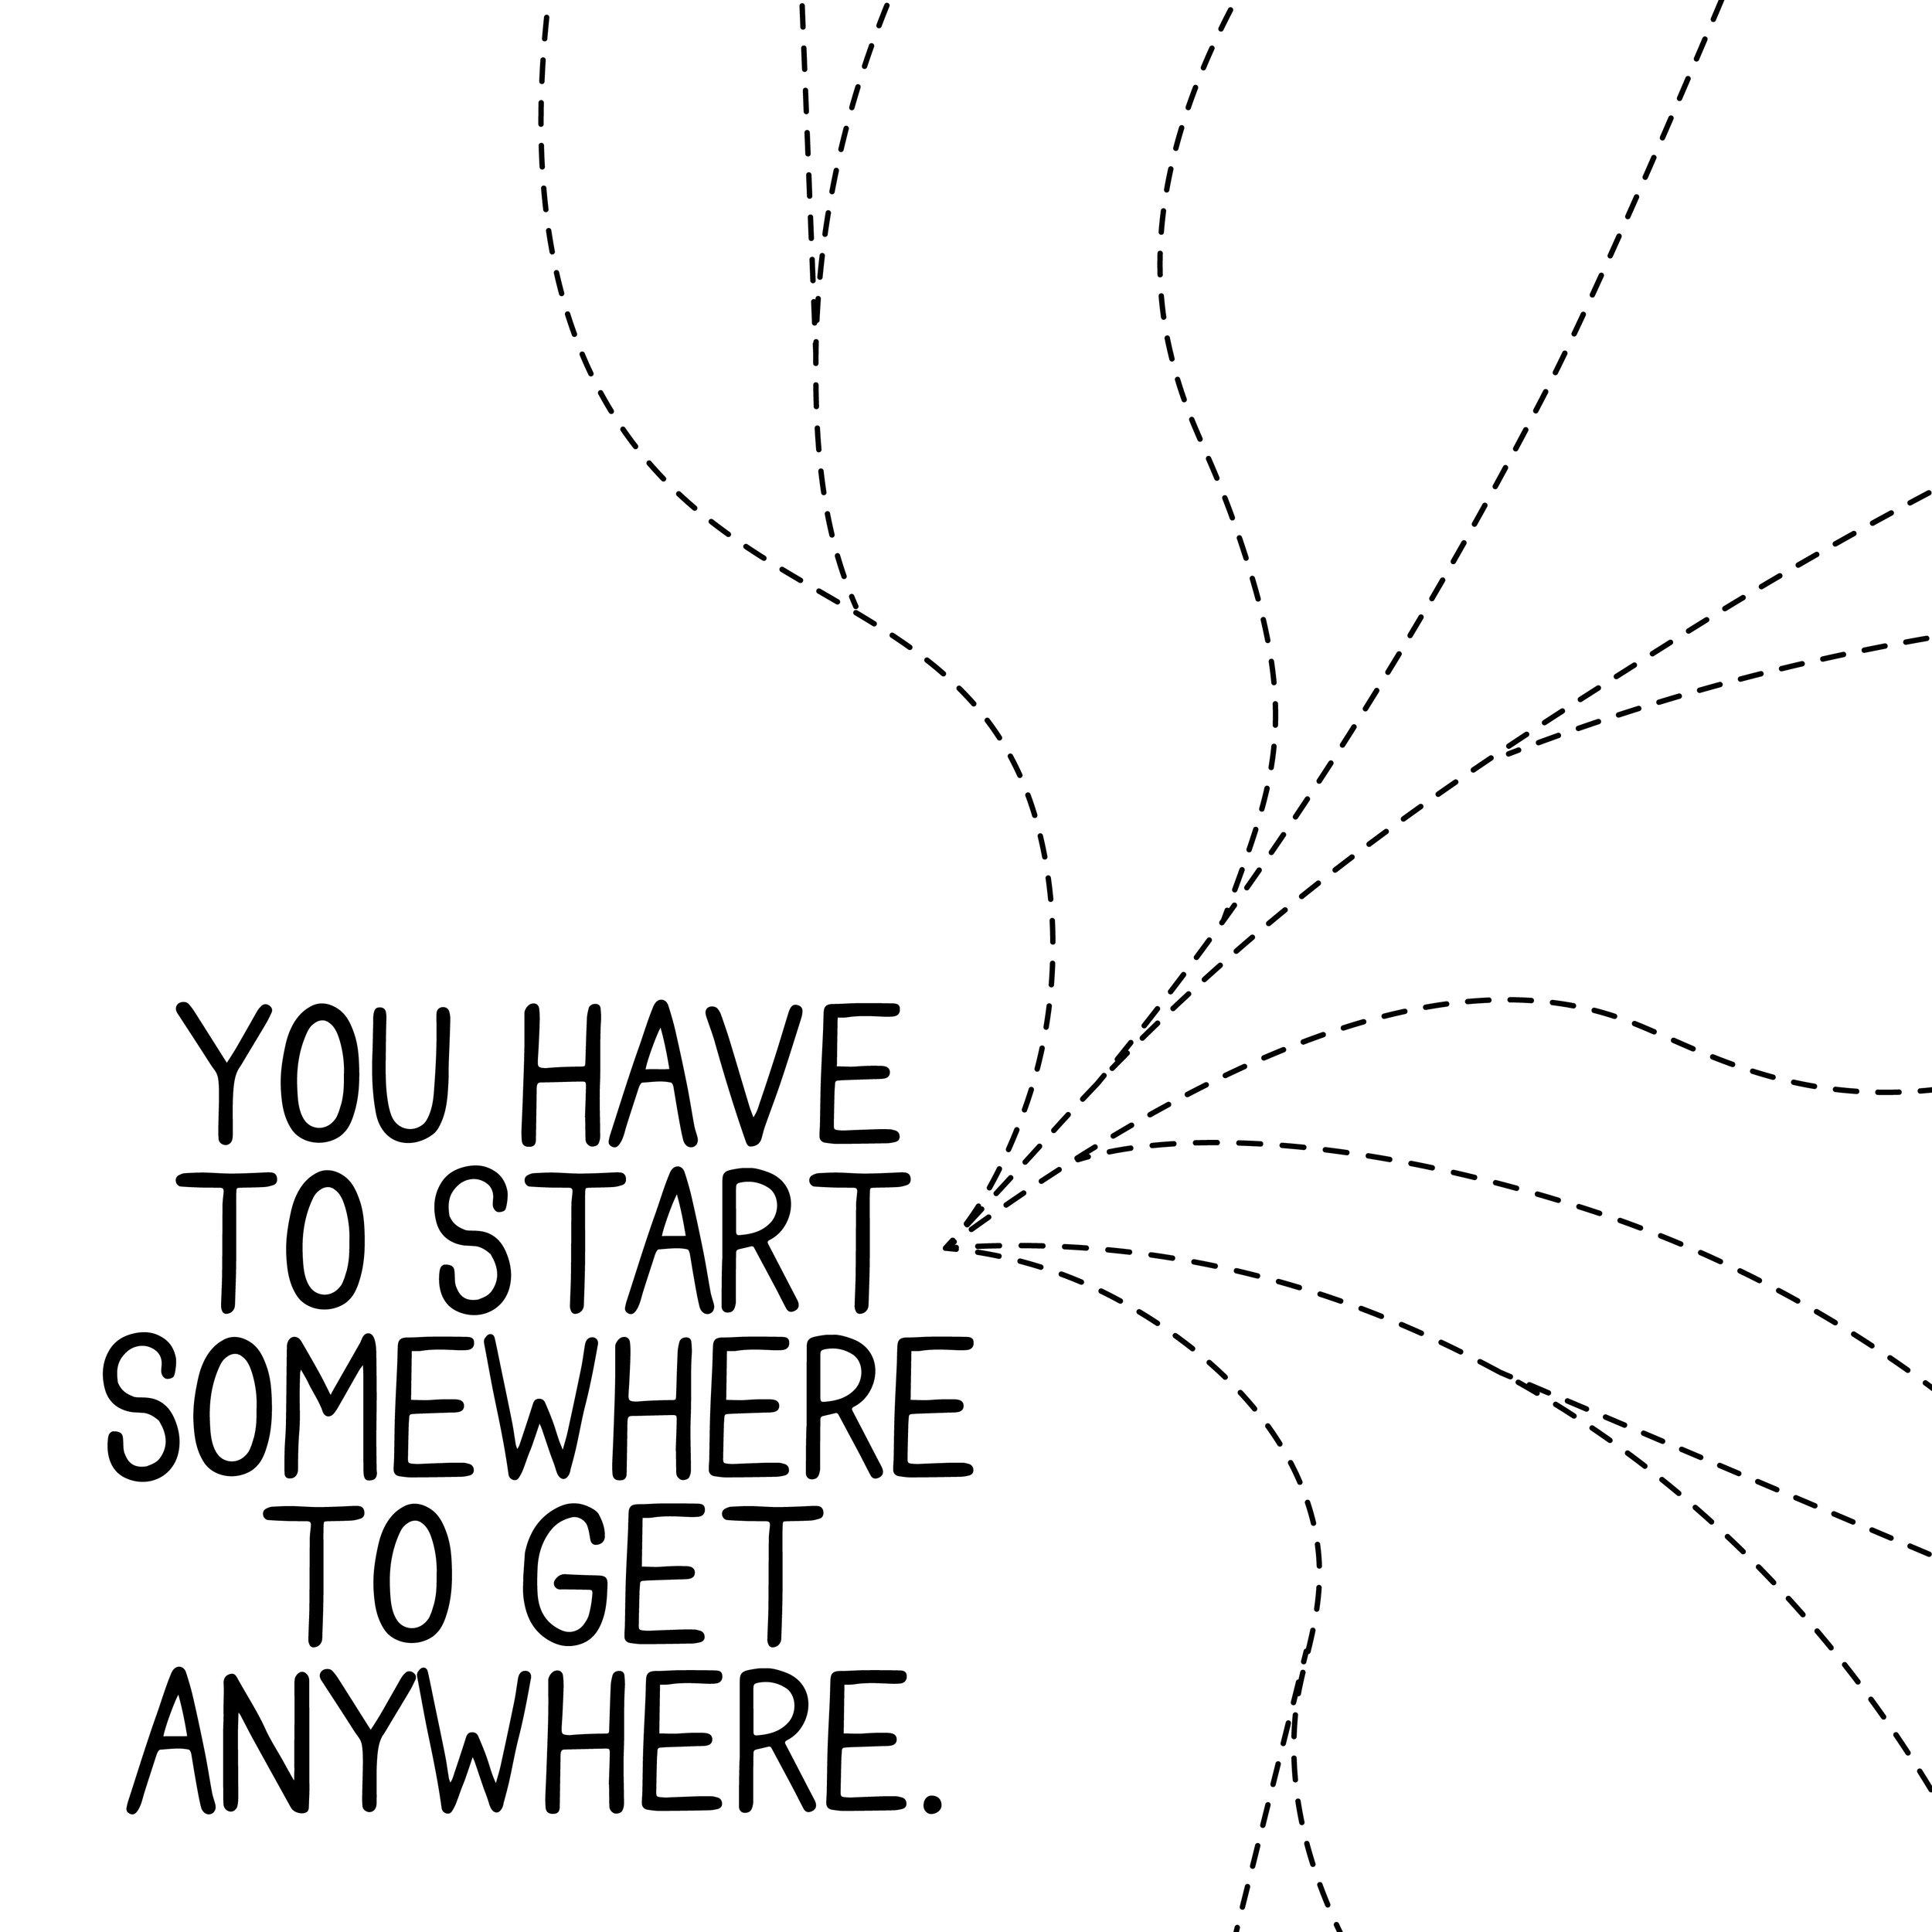 somewhereanywhere-01.jpg